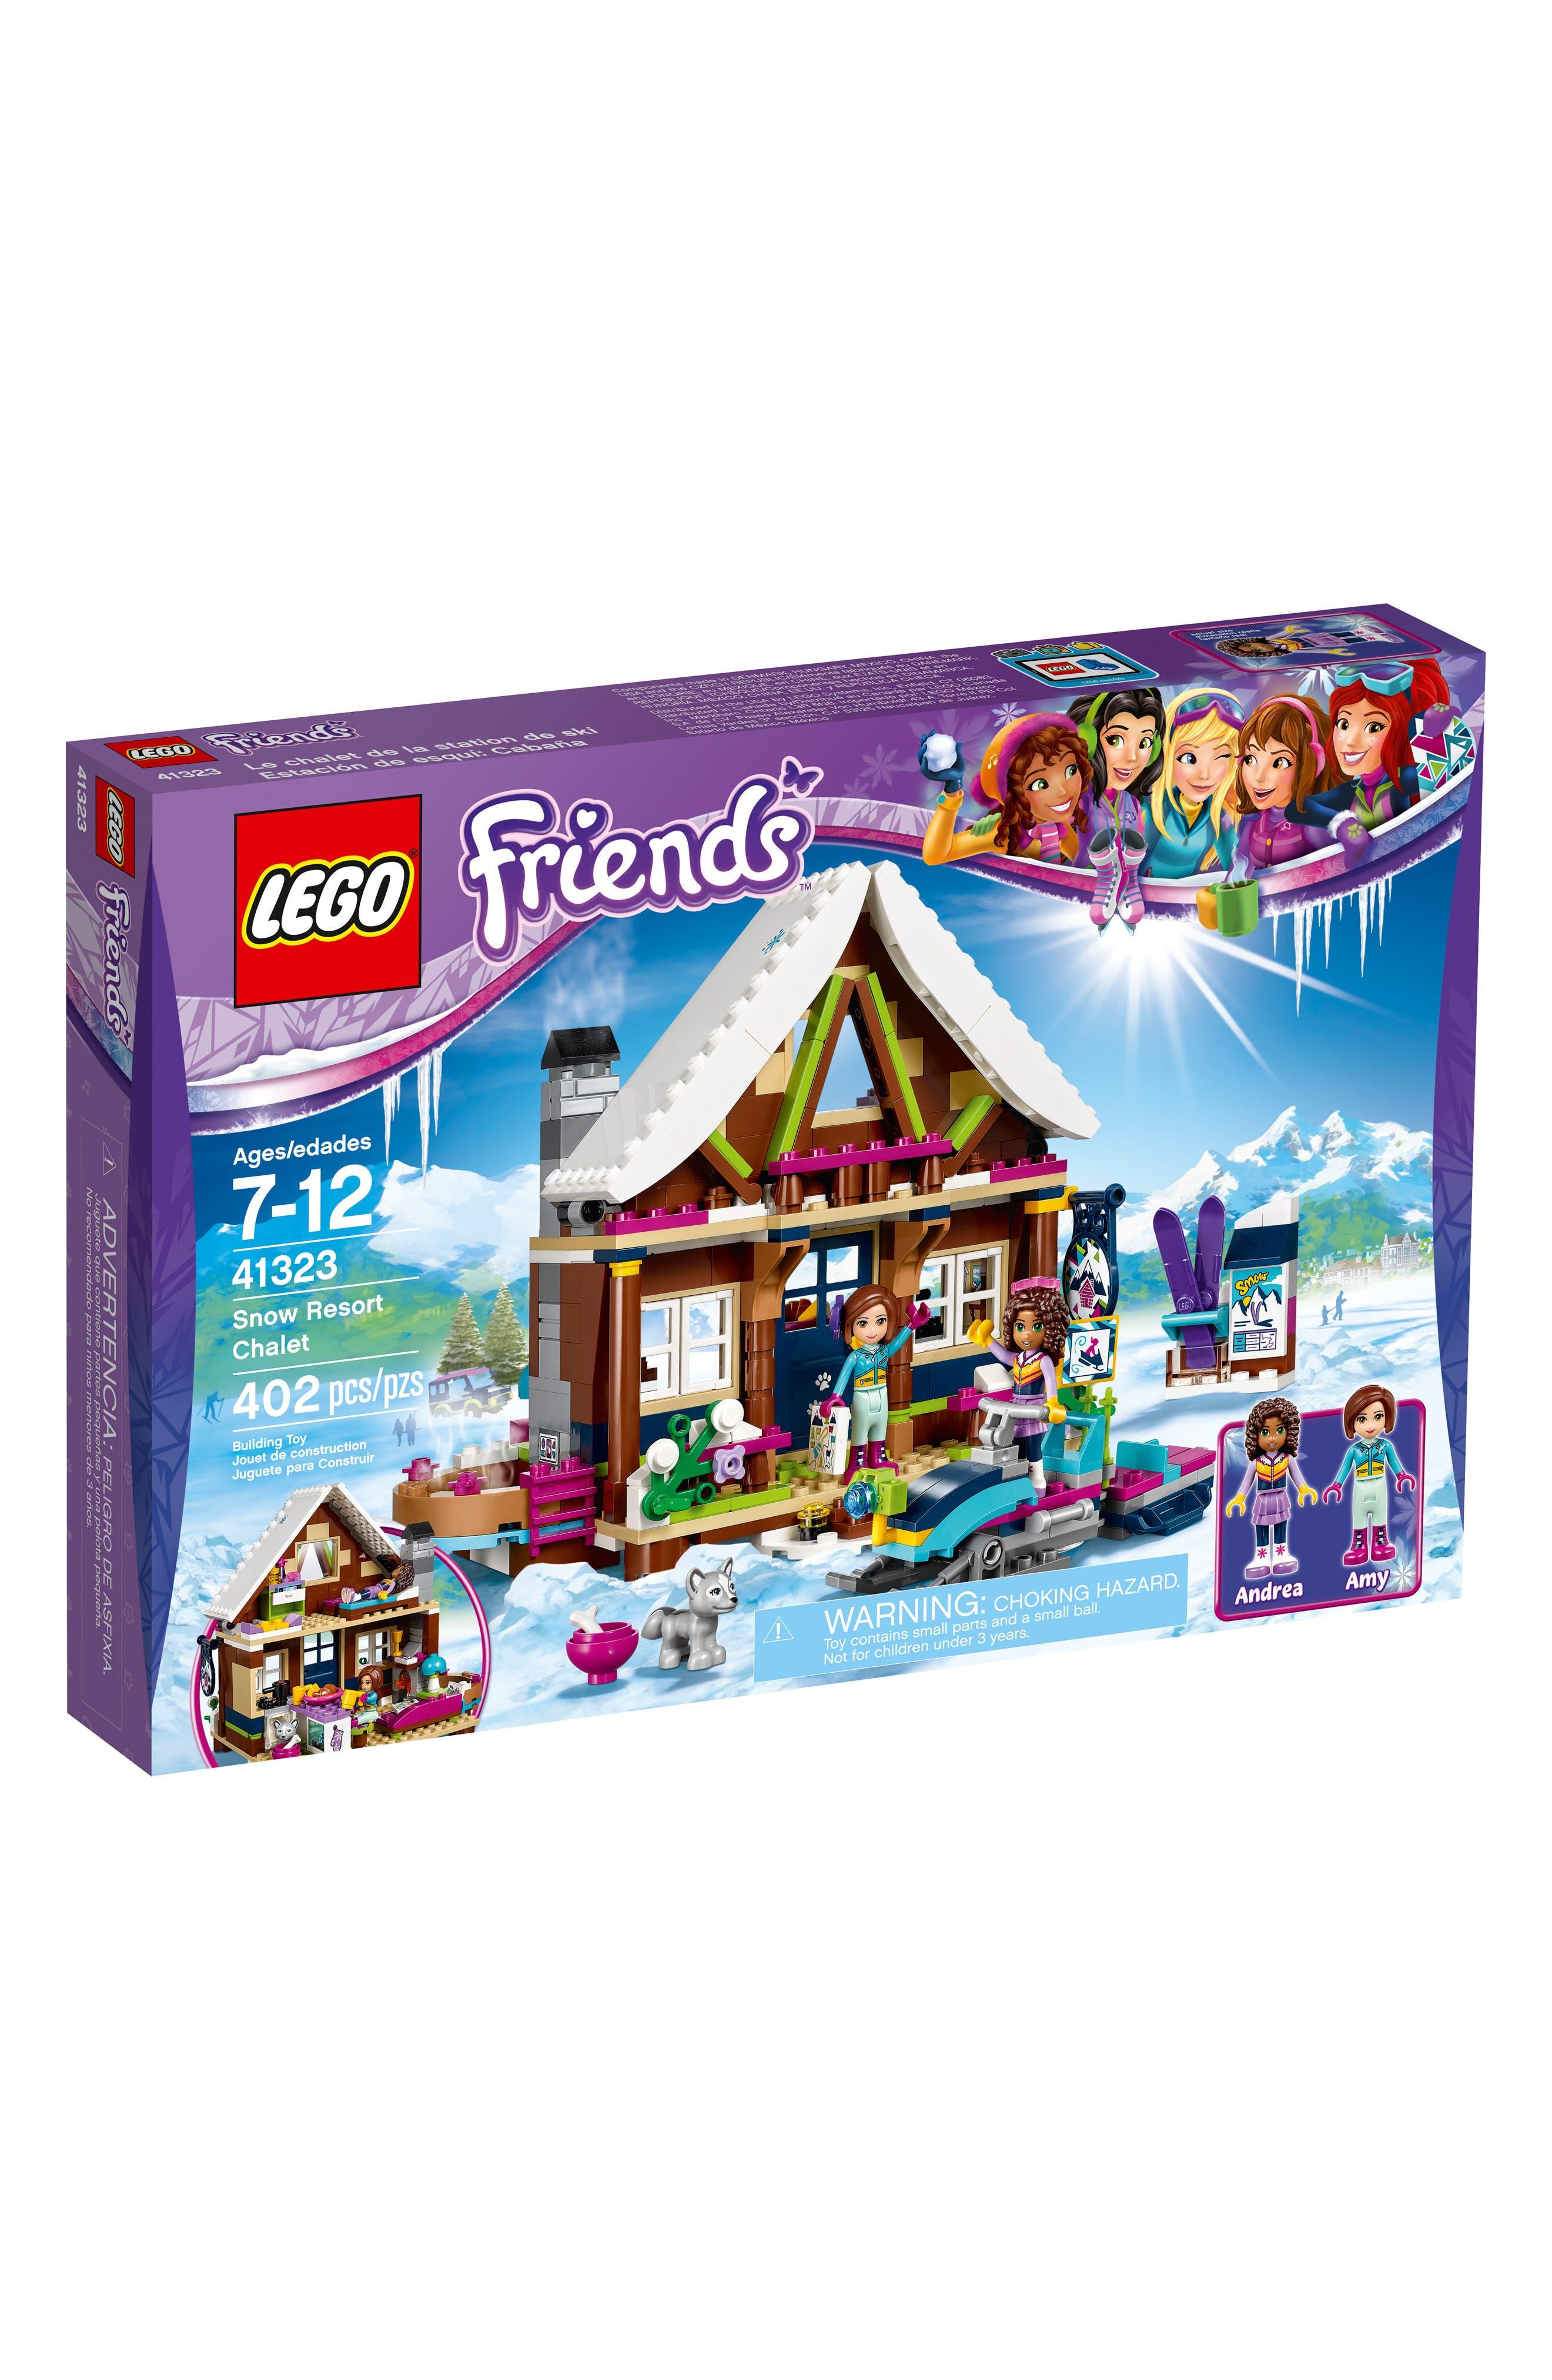 LEGO® Friends Snow Resort Chalet Play Set - 41323